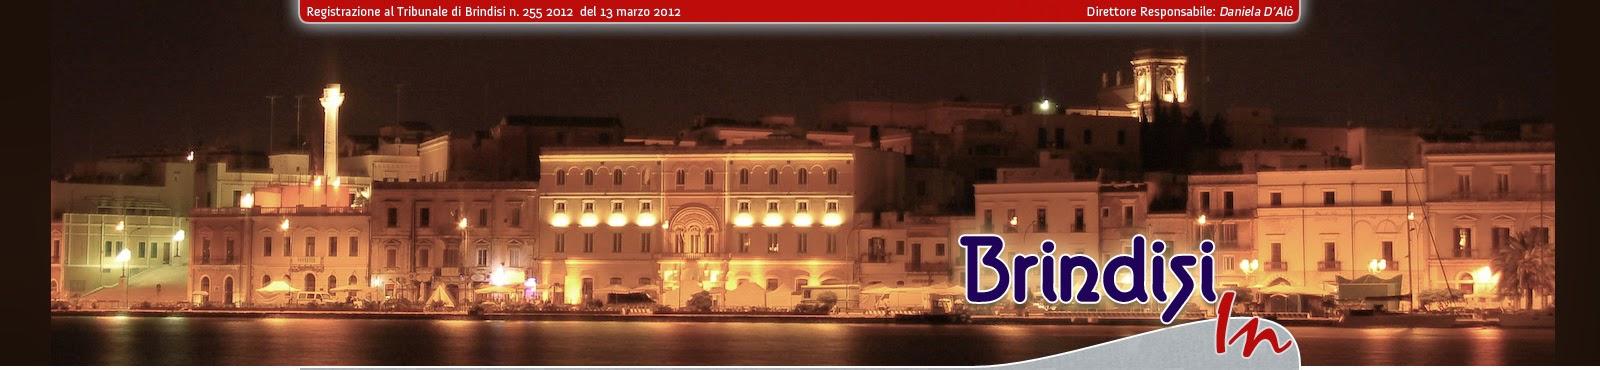 http://www.brindisiin.it/terra-e-legalita-a-torre-s-susanna_content_1312_1.htm